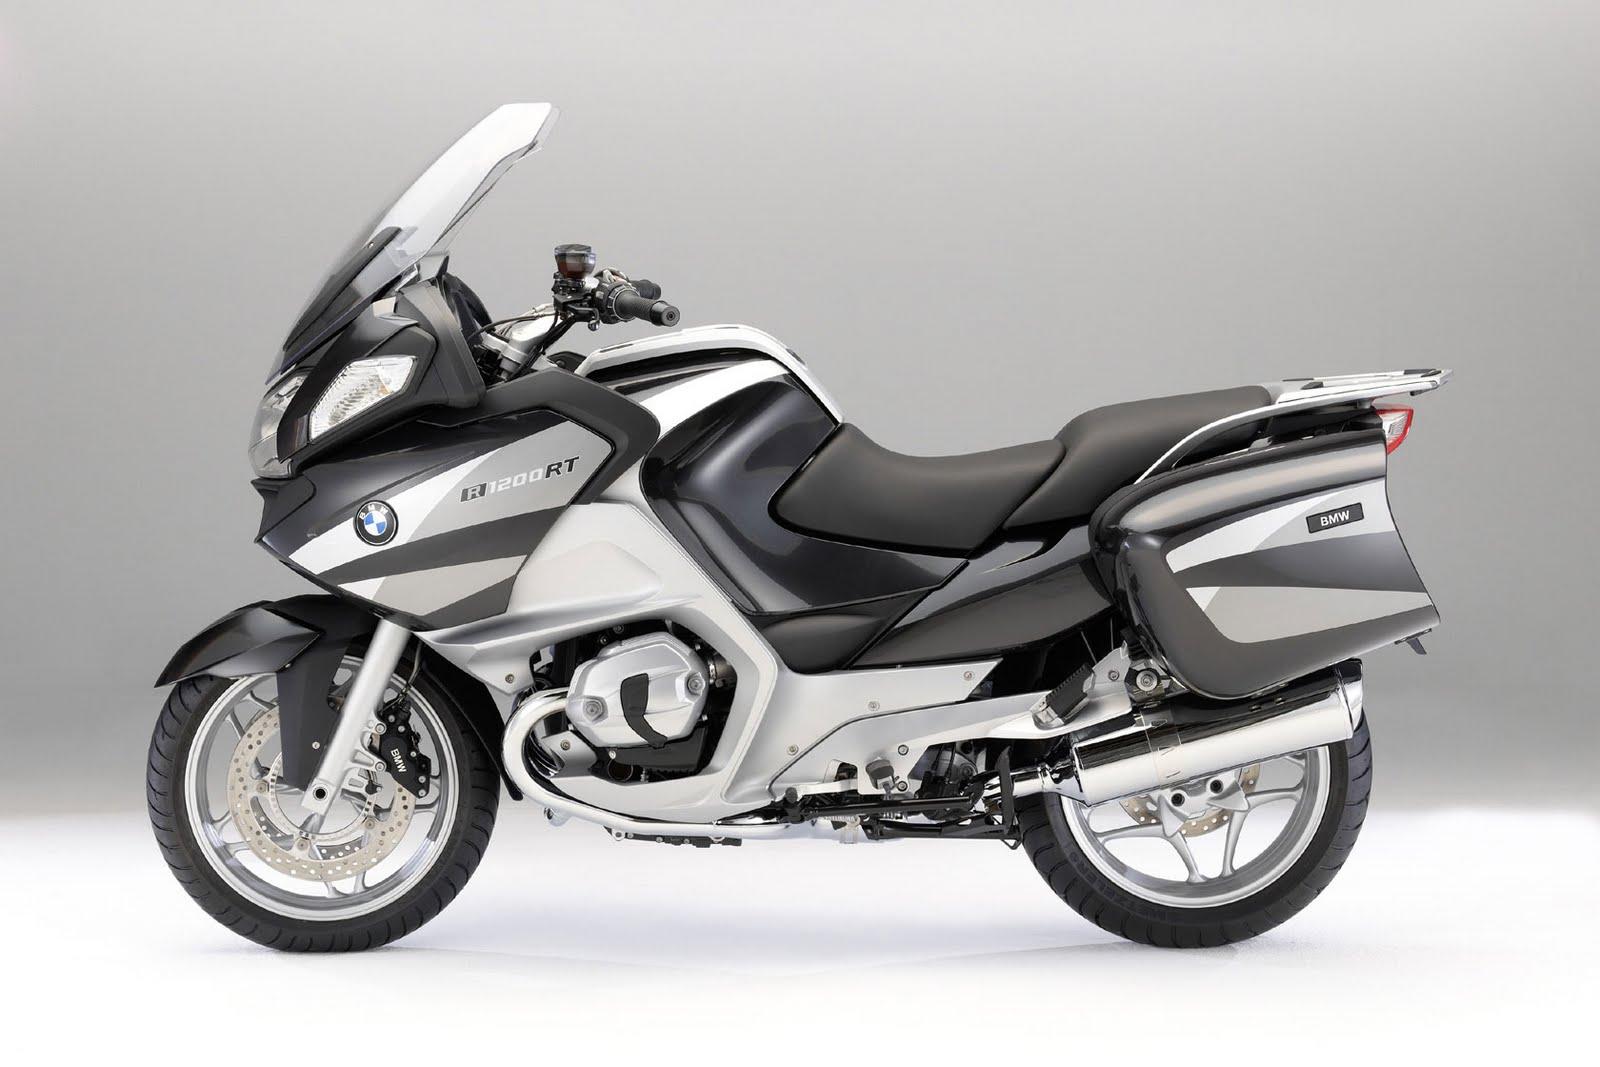 http://2.bp.blogspot.com/_FpGcbrYTyDw/TEZ5bF6lm0I/AAAAAAAAA-g/vflubCg3LSg/s1600/2010+BMW+R1200RT+side.jpg